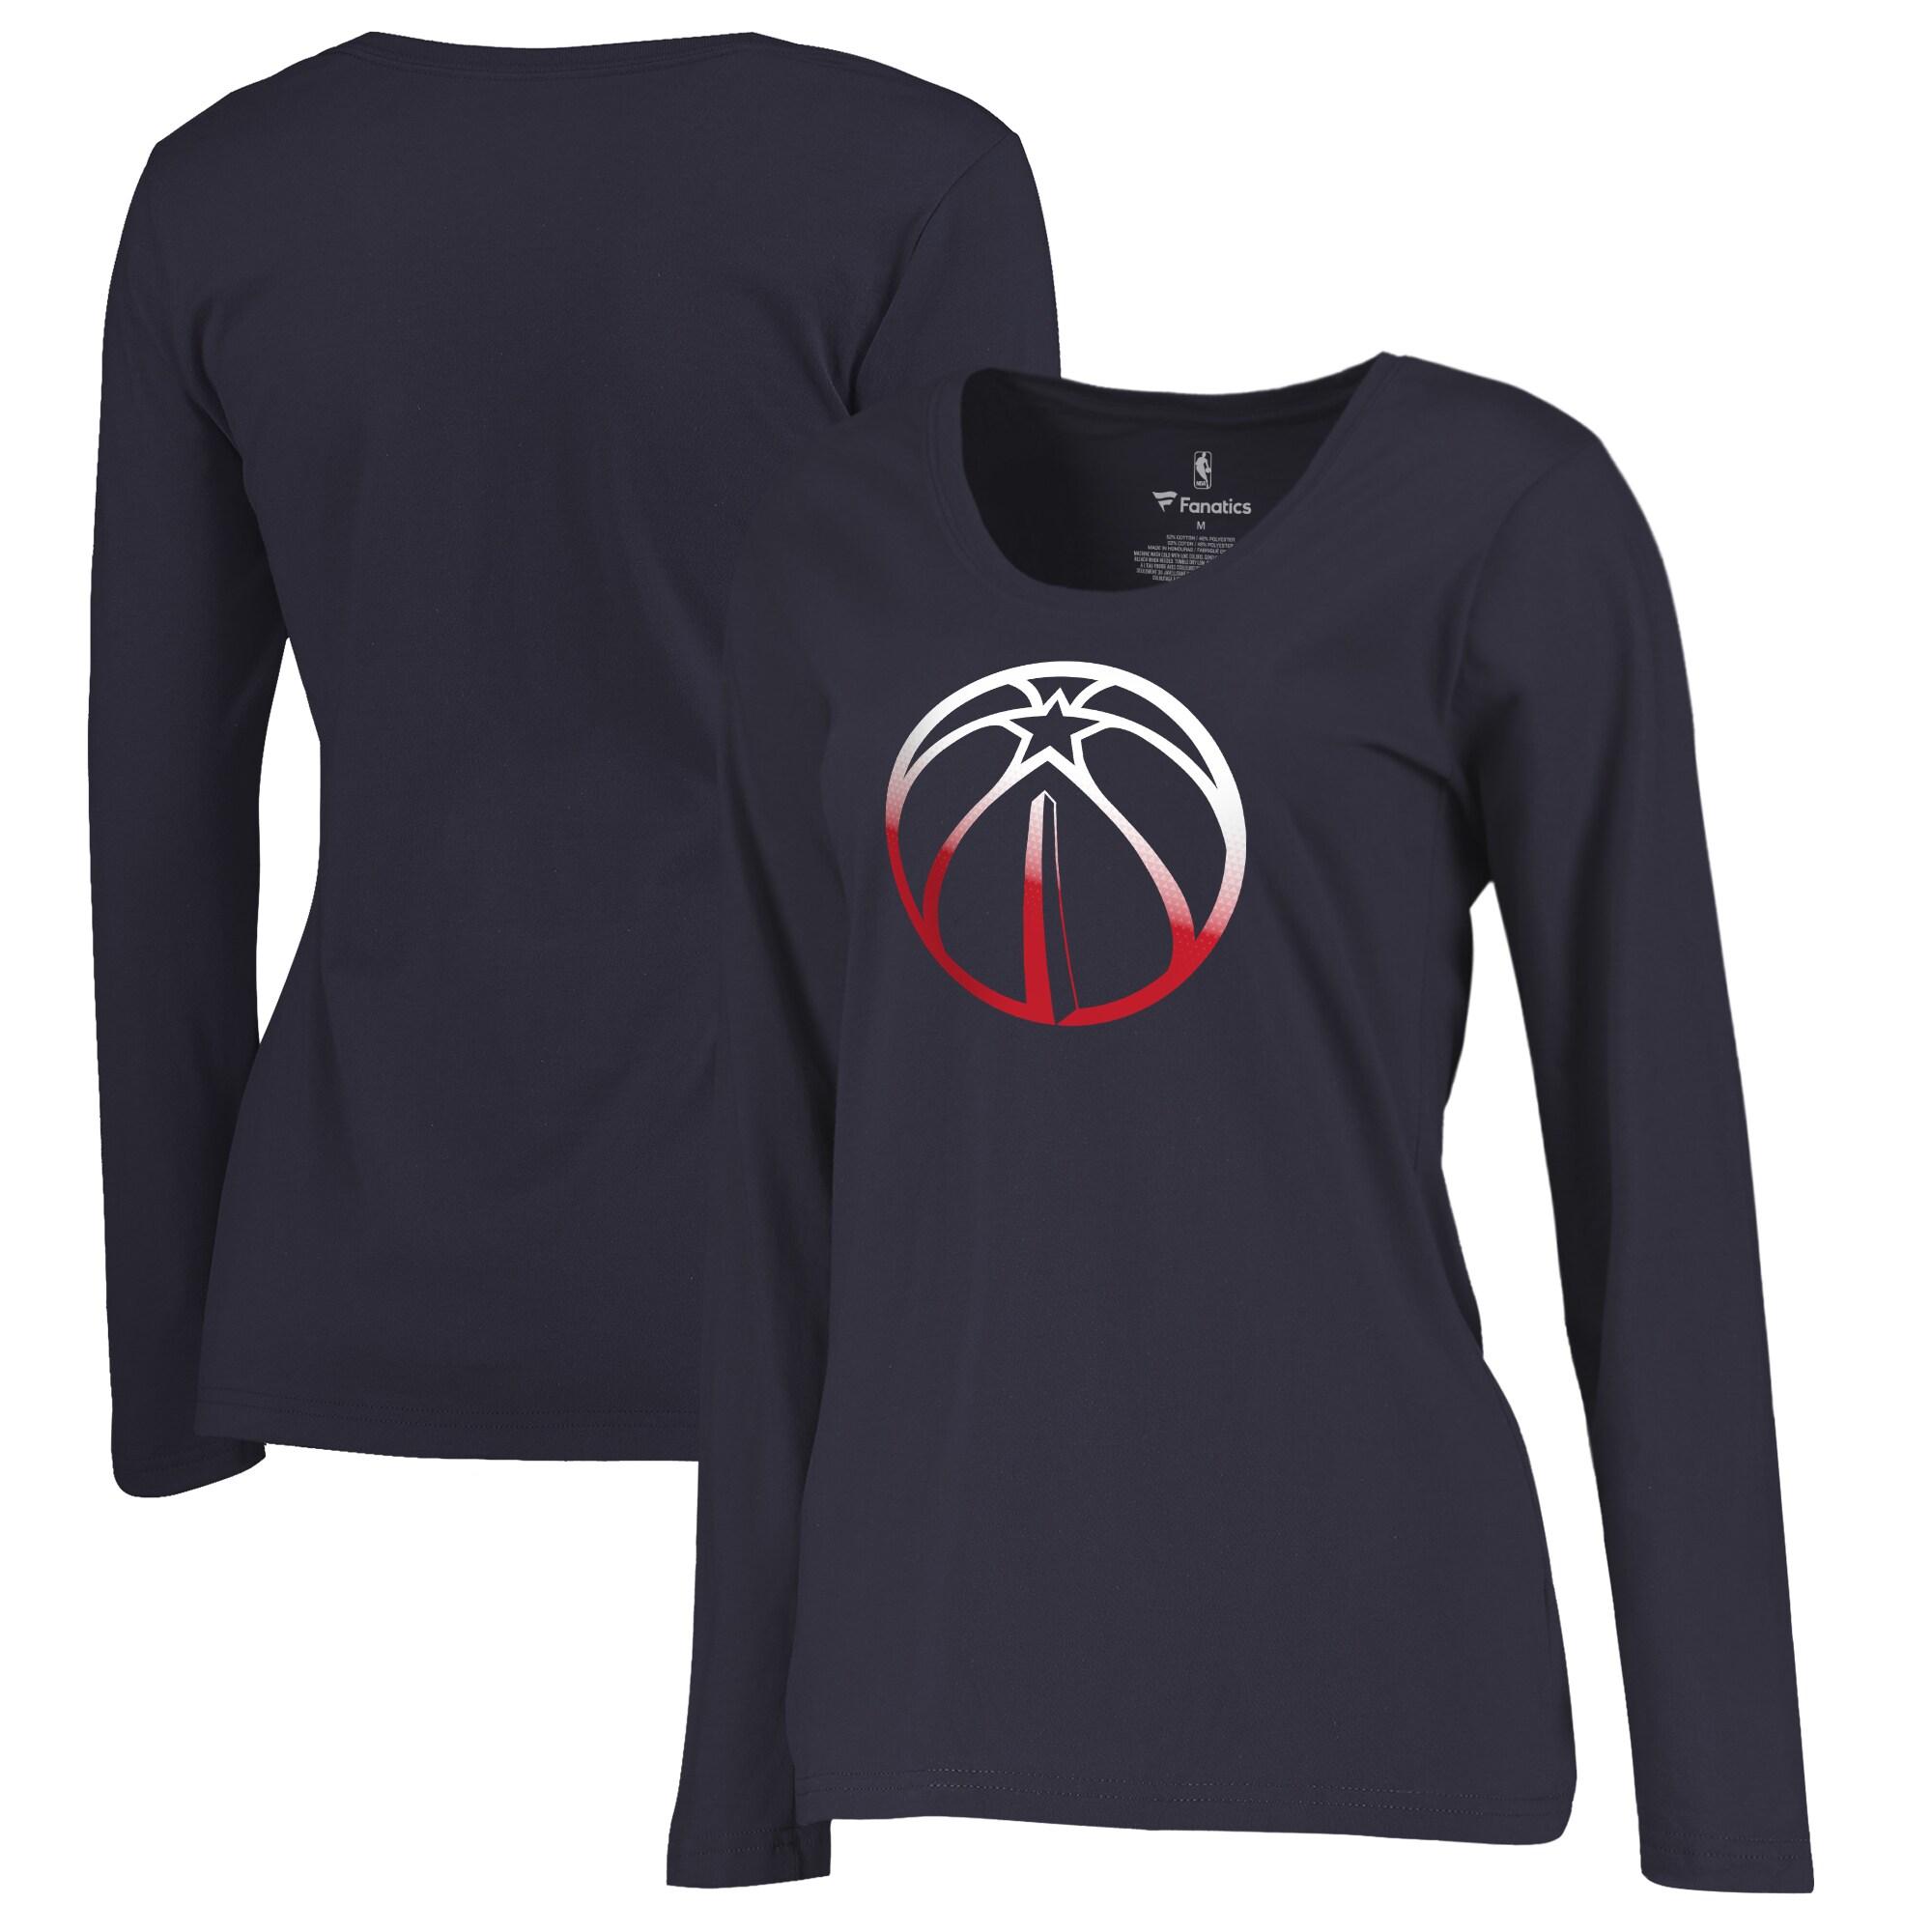 Washington Wizards Fanatics Branded Women's Plus Sizes Gradient Logo Long Sleeve T-Shirt - Navy